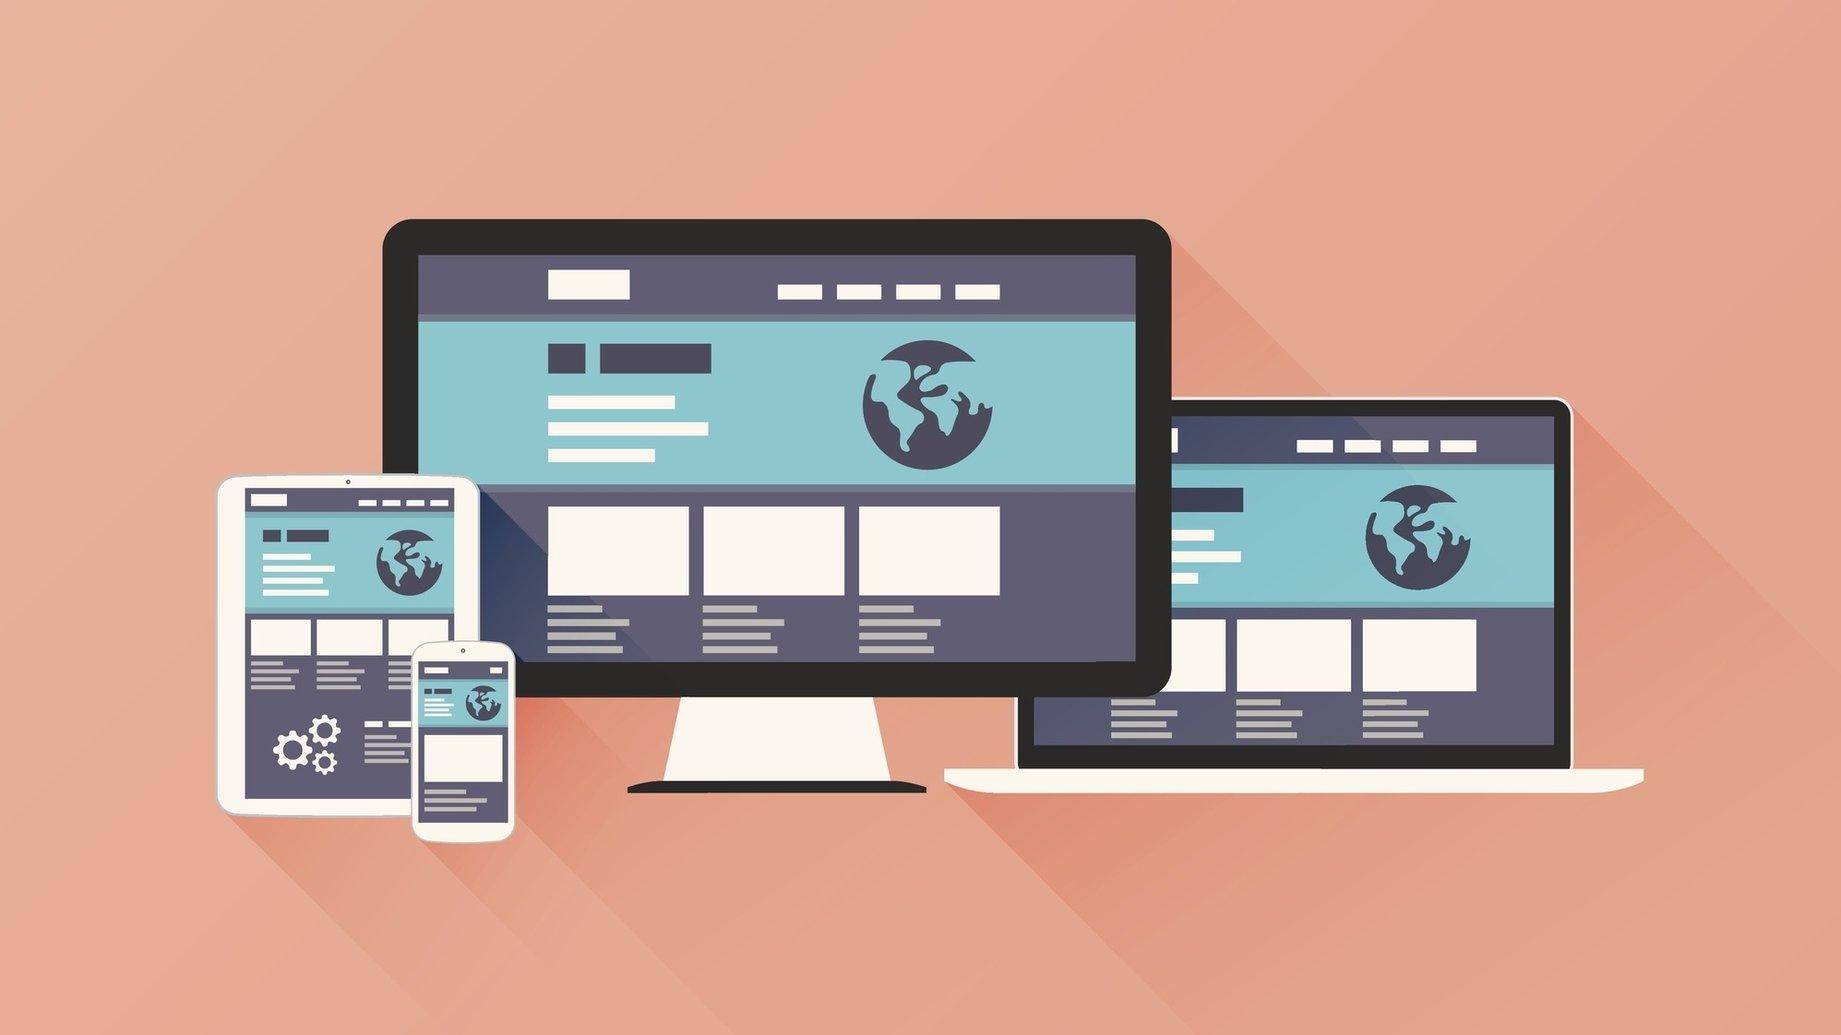 web-redesign-by-agency-630906-edited.jpg